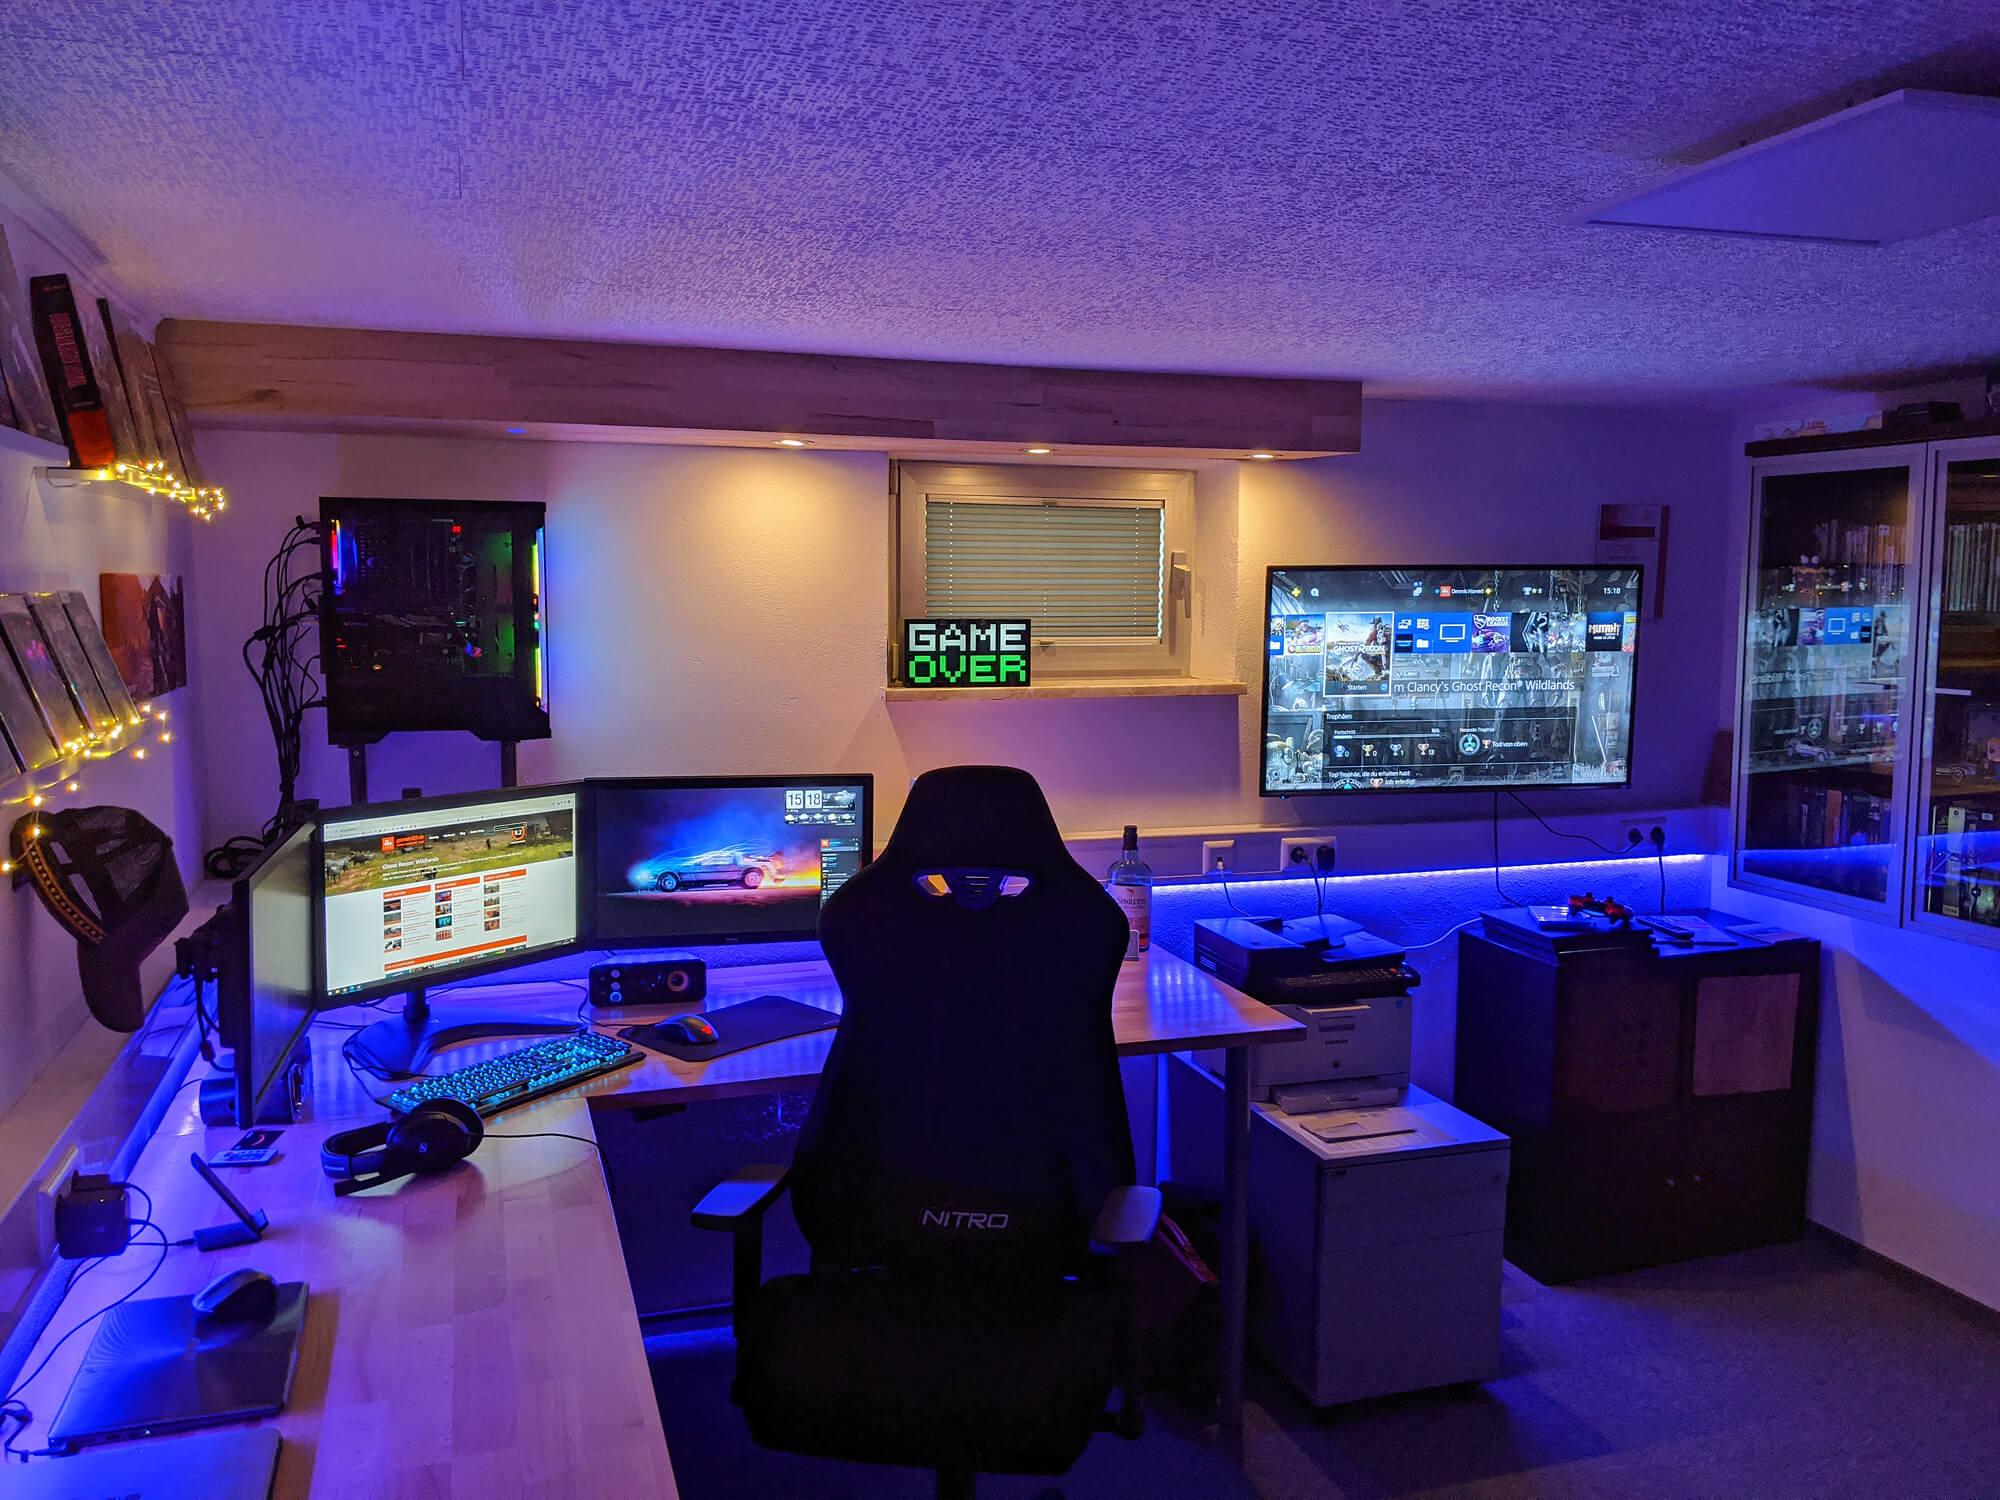 Gaming Room 21 - Ergebnis 1